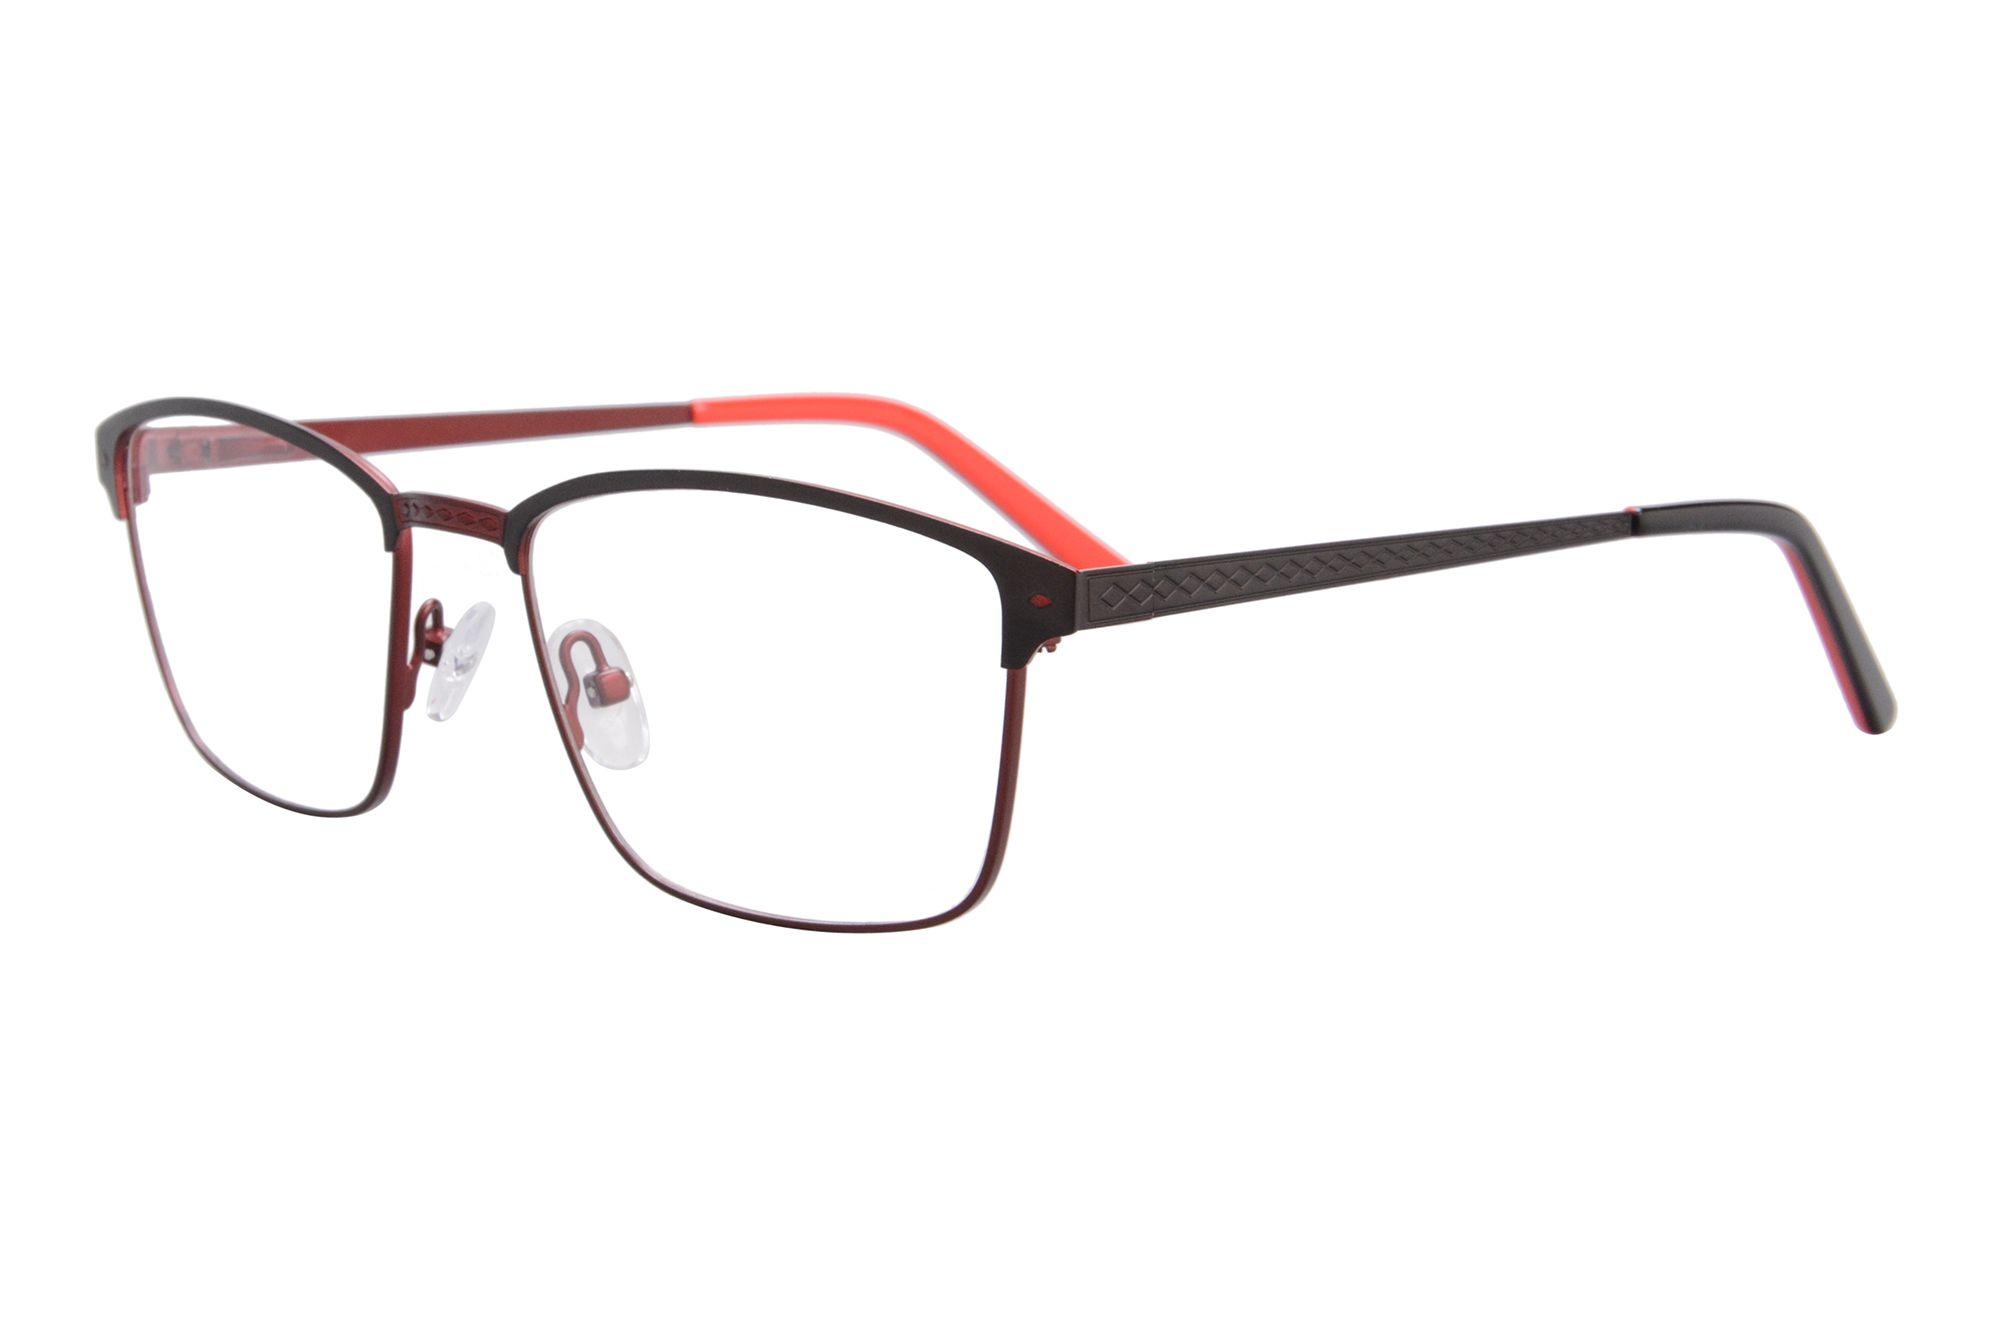 dab5edaba9e Flexible Short Sight Glasses Myopia Eyeglass Nearsighted Reading Glasses -1.0~6.0